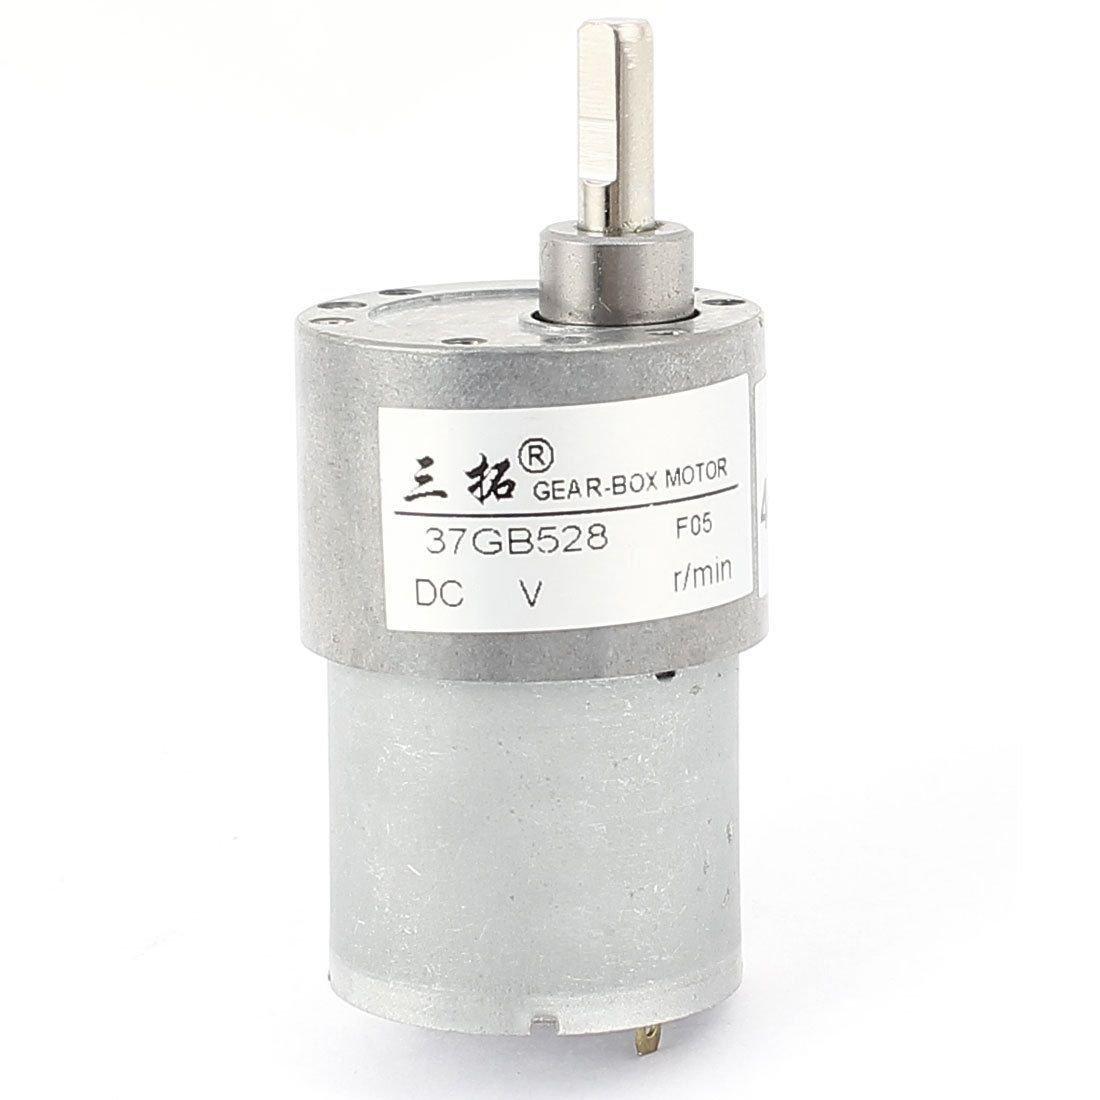 DC 12V 38RPM 0.2A 2KG.cm High Torque DC Gear Box Reducer Variable Speed Motor